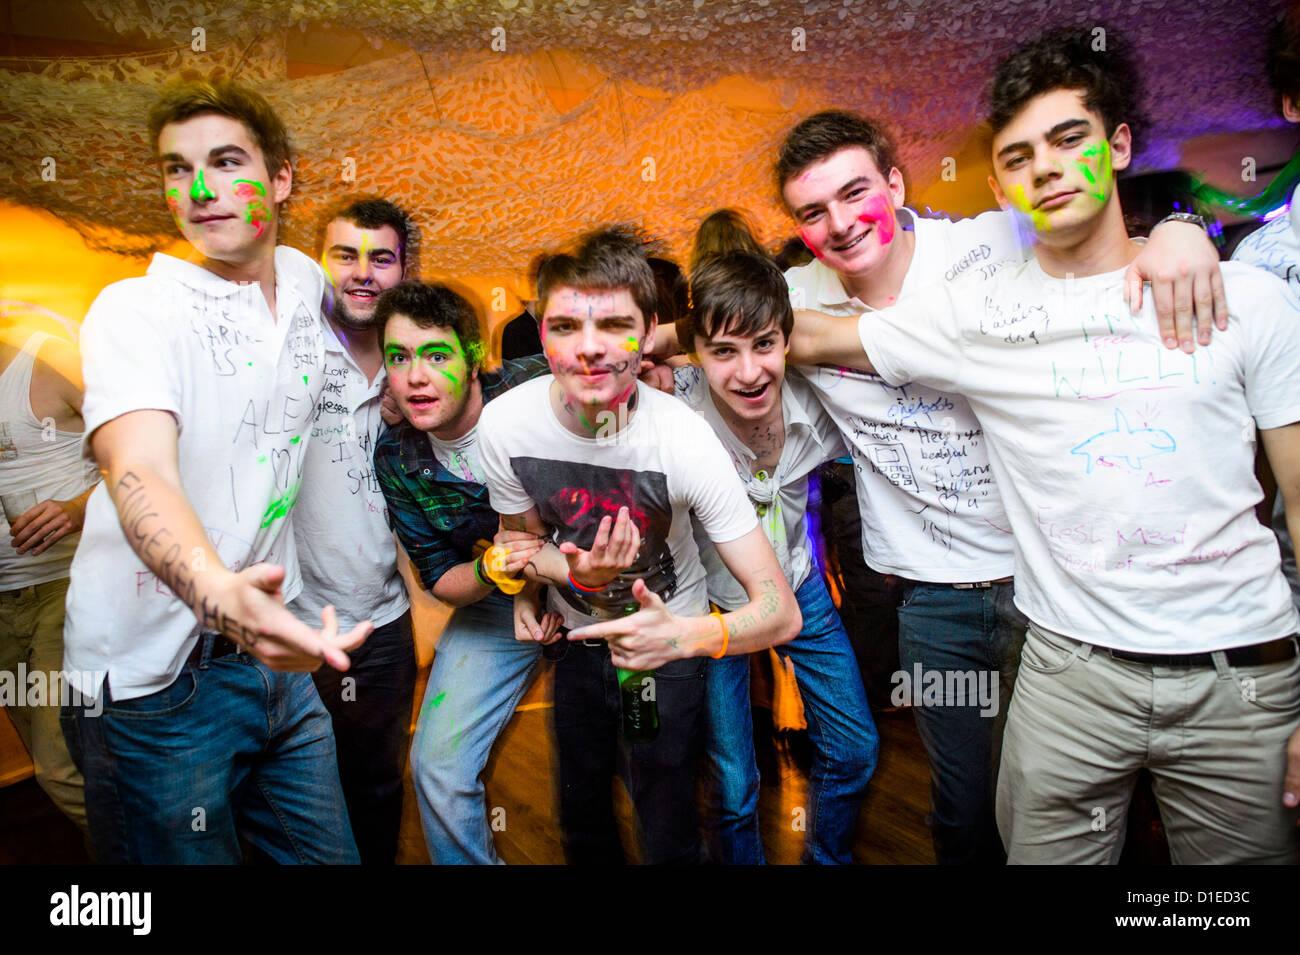 night club partying girls and boys stock photos night club